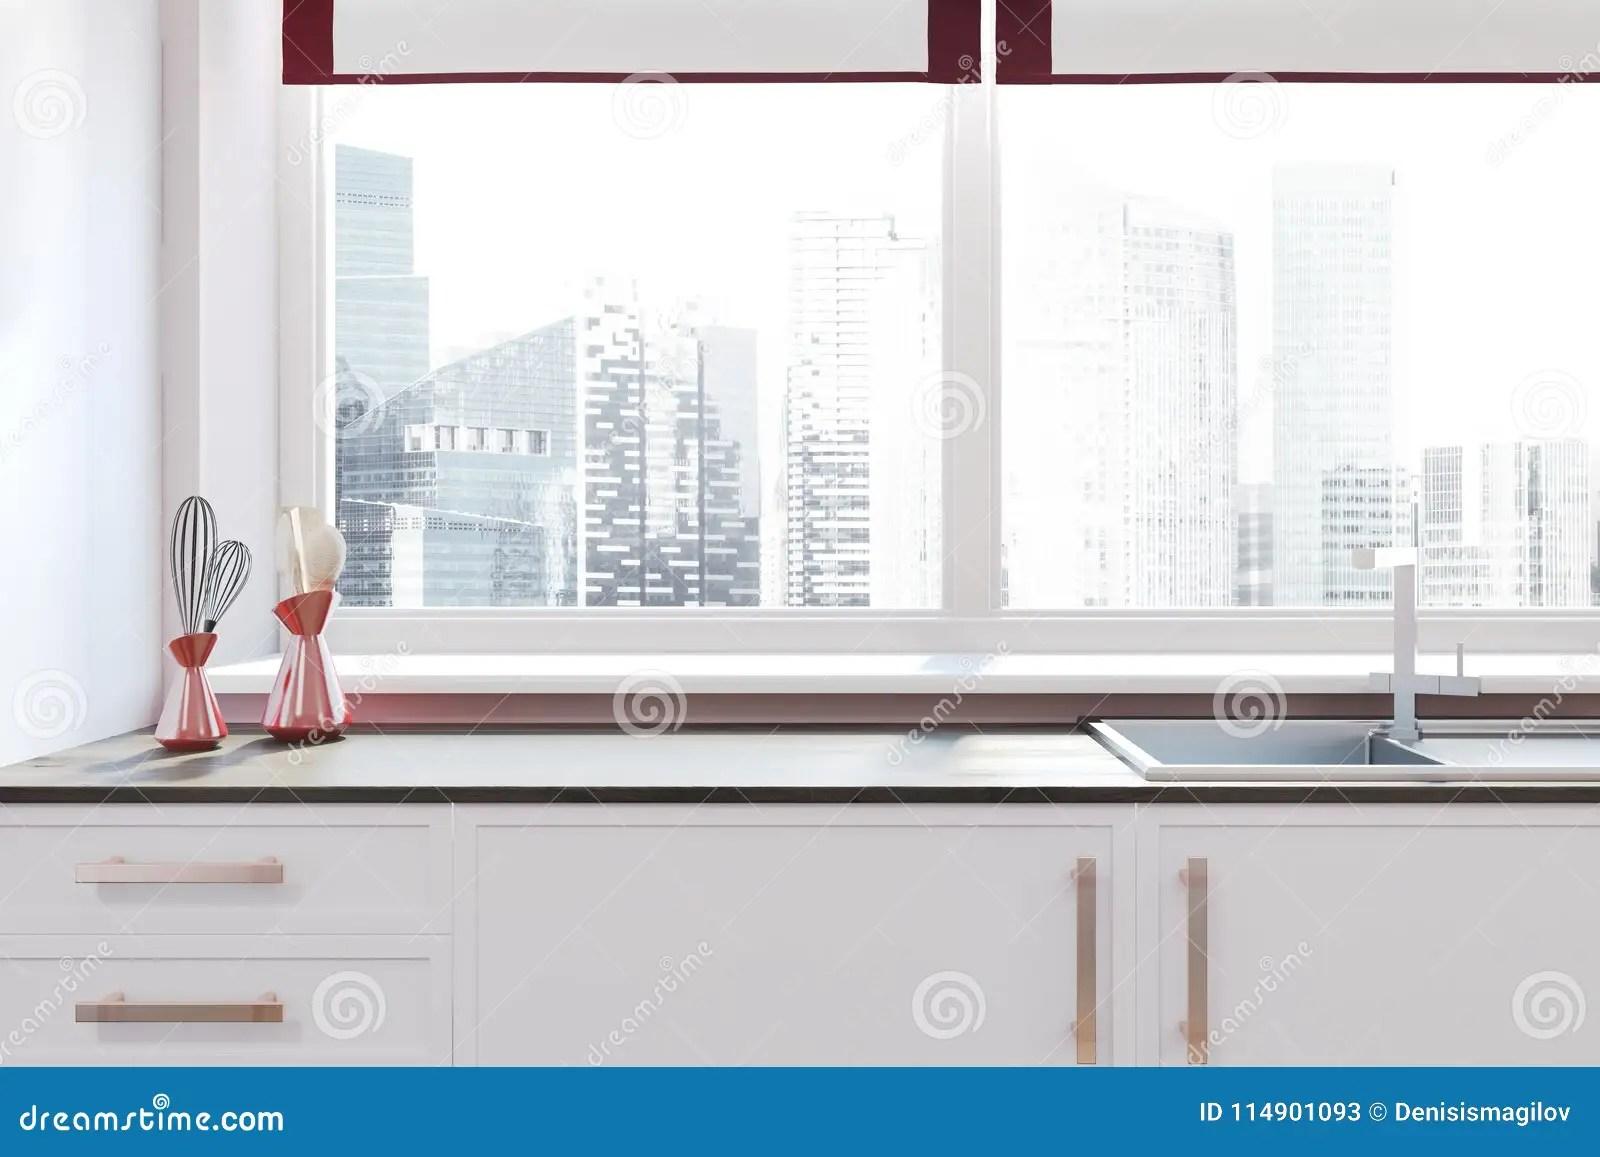 blanco kitchen sink stoves gas 在窗口附近的白色厨房水槽与都市风景库存例证 插画包括有现代 计数器 在窗口附近的白色厨房水槽与都市风景